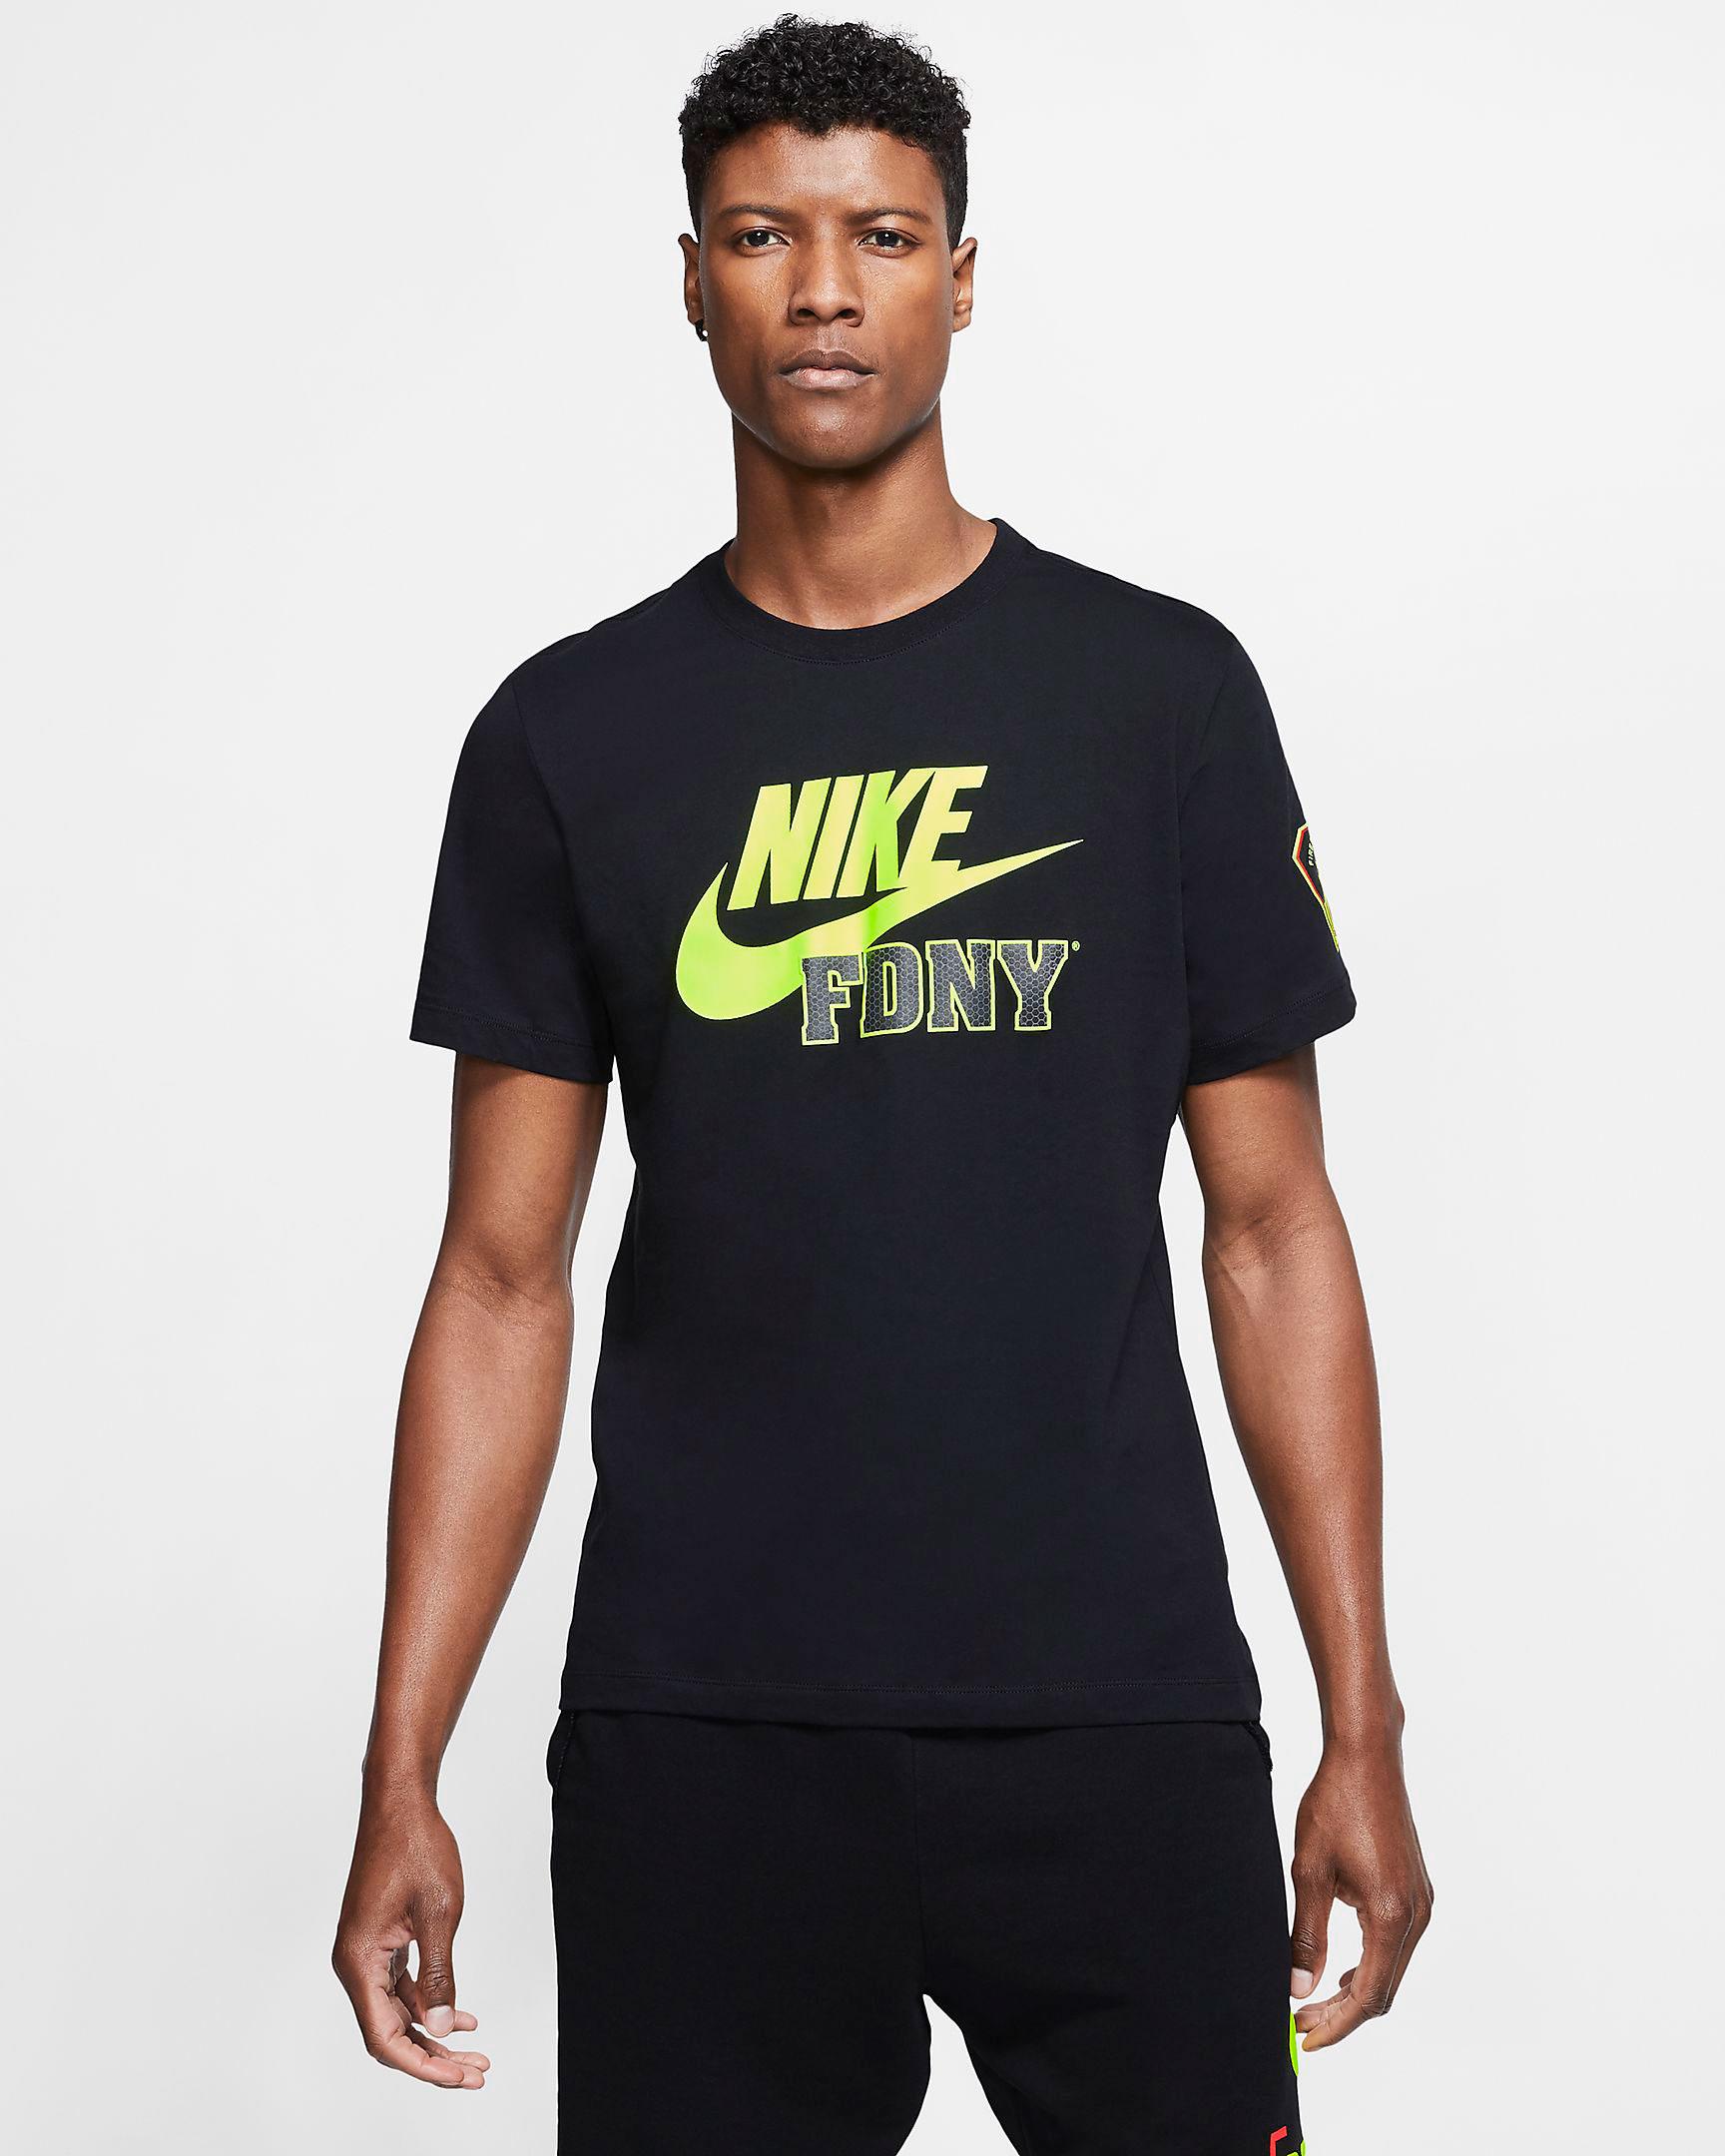 nike-air-max-90-fdny-shirt-1